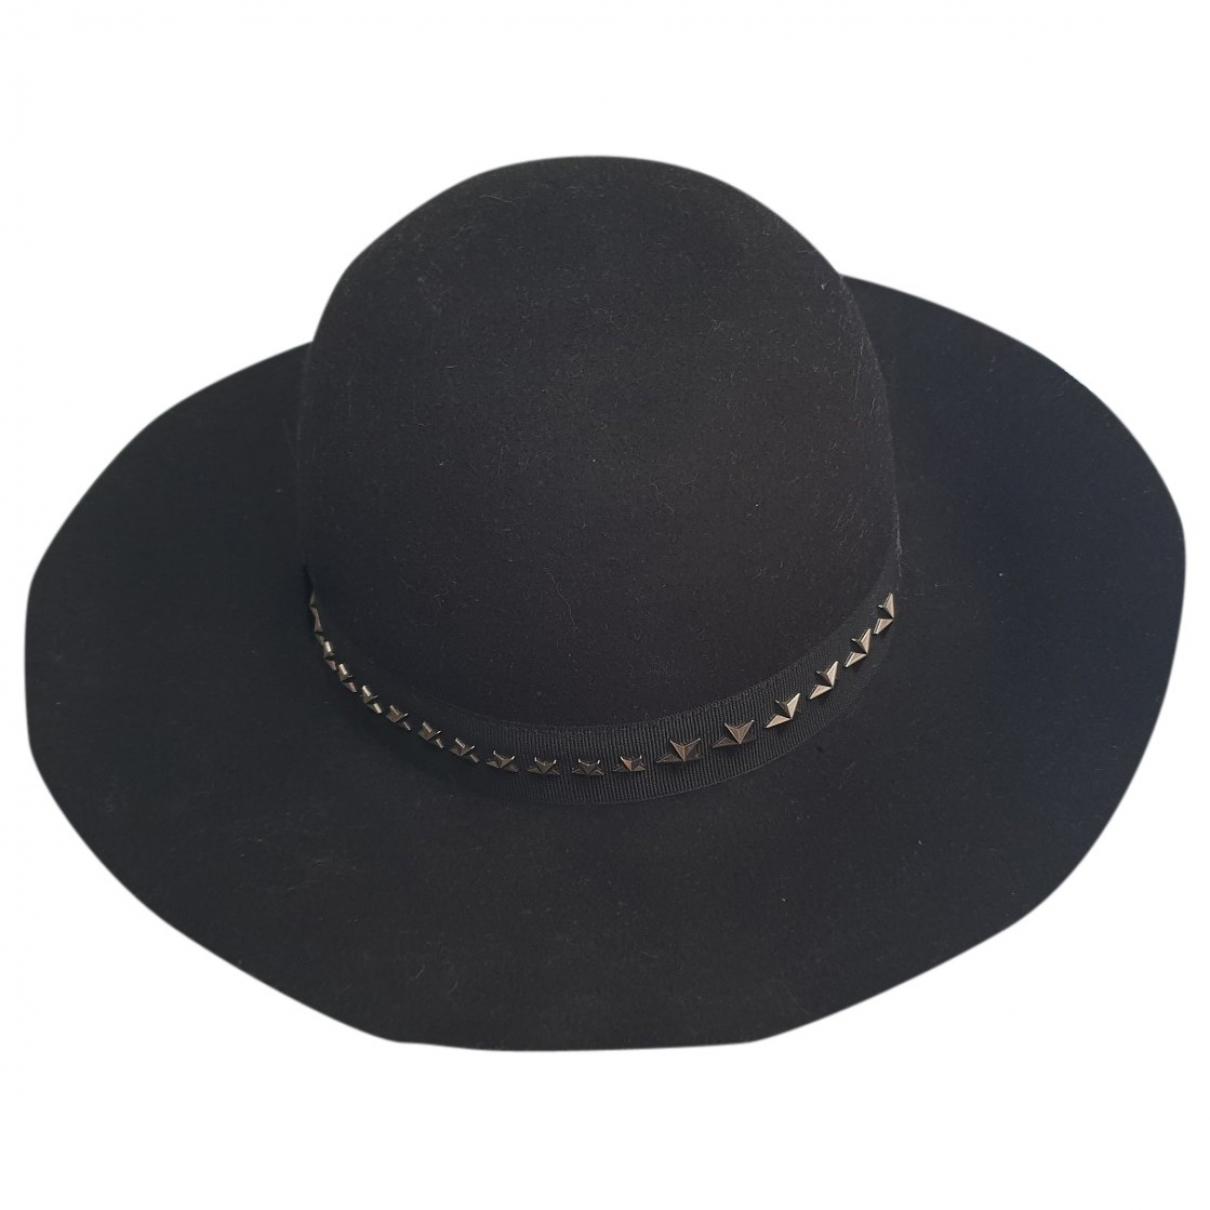 Jimmy Choo \N Black Wool hat for Women M International